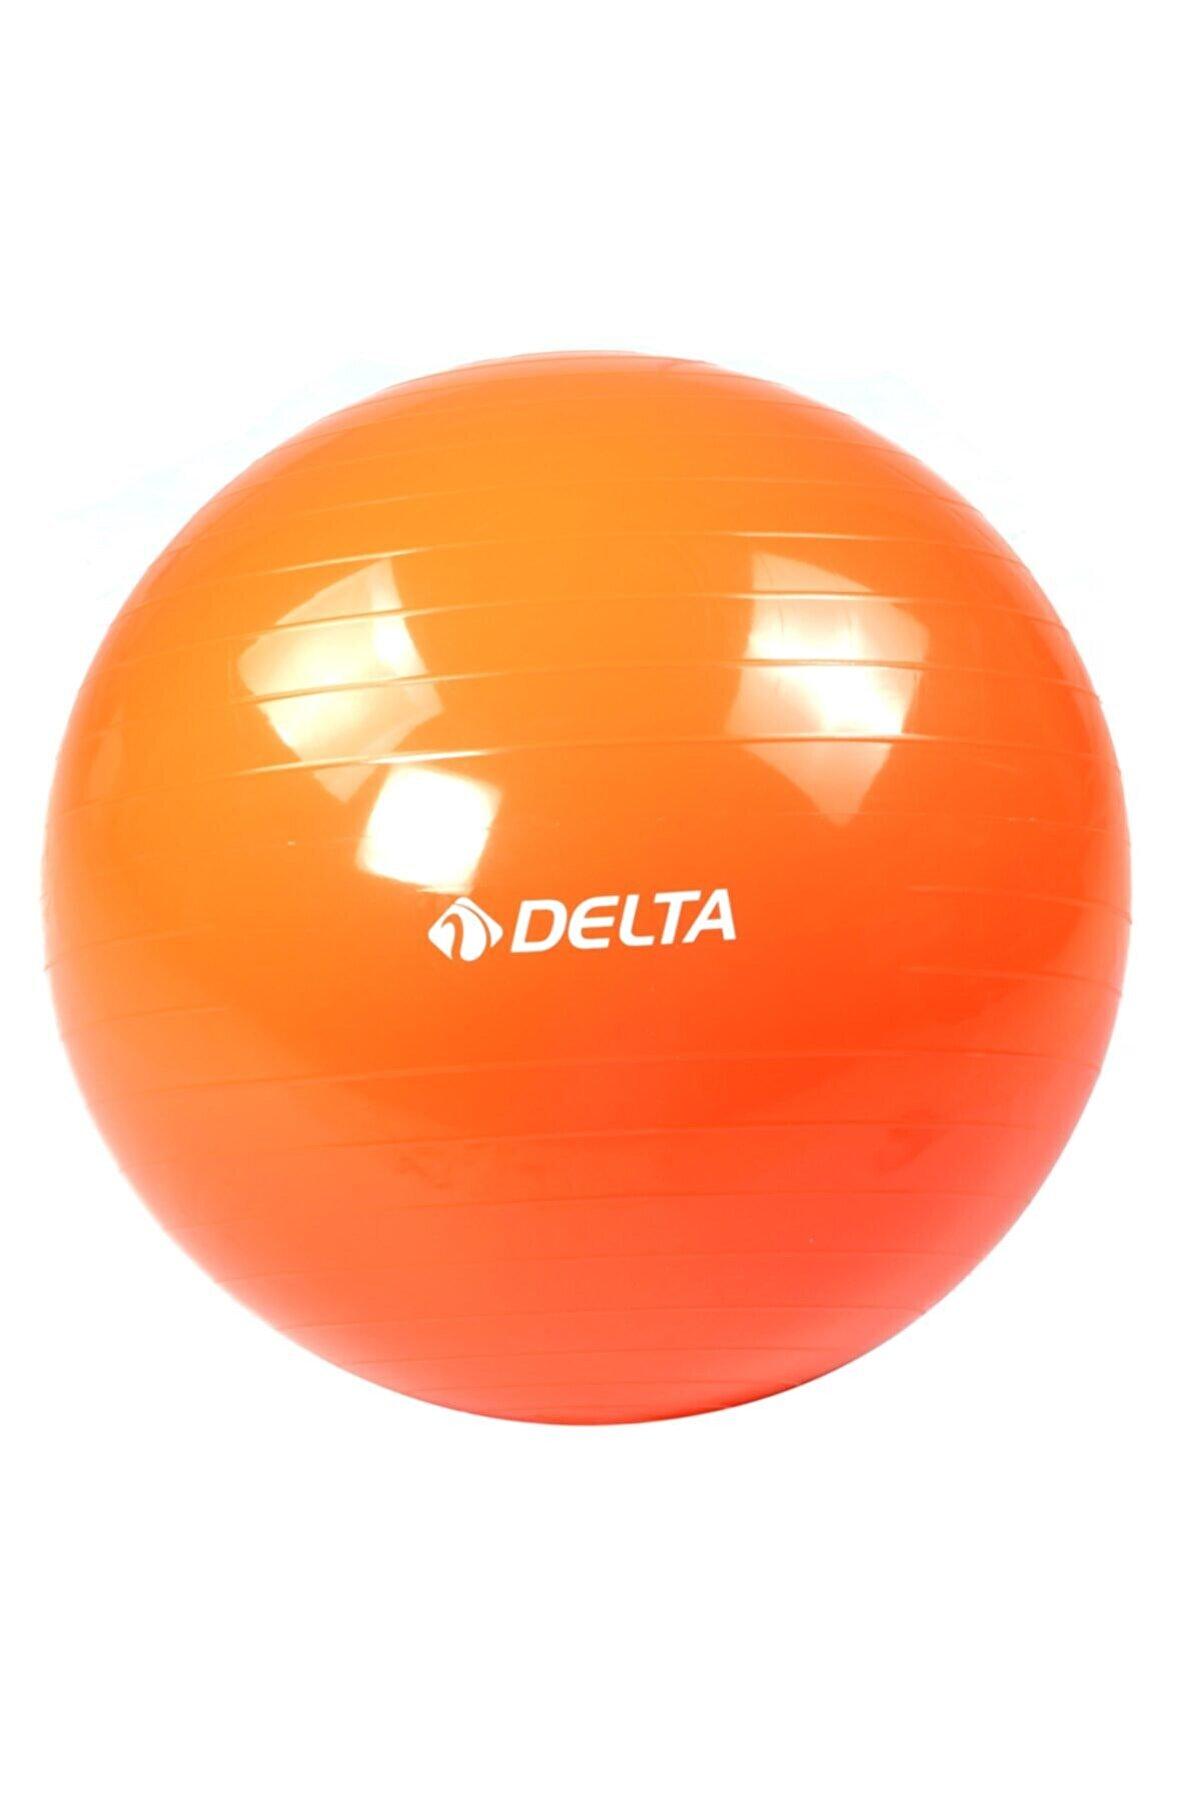 Delta Turuncu  Dura Strong Deluxe Pilates Topu 55cm